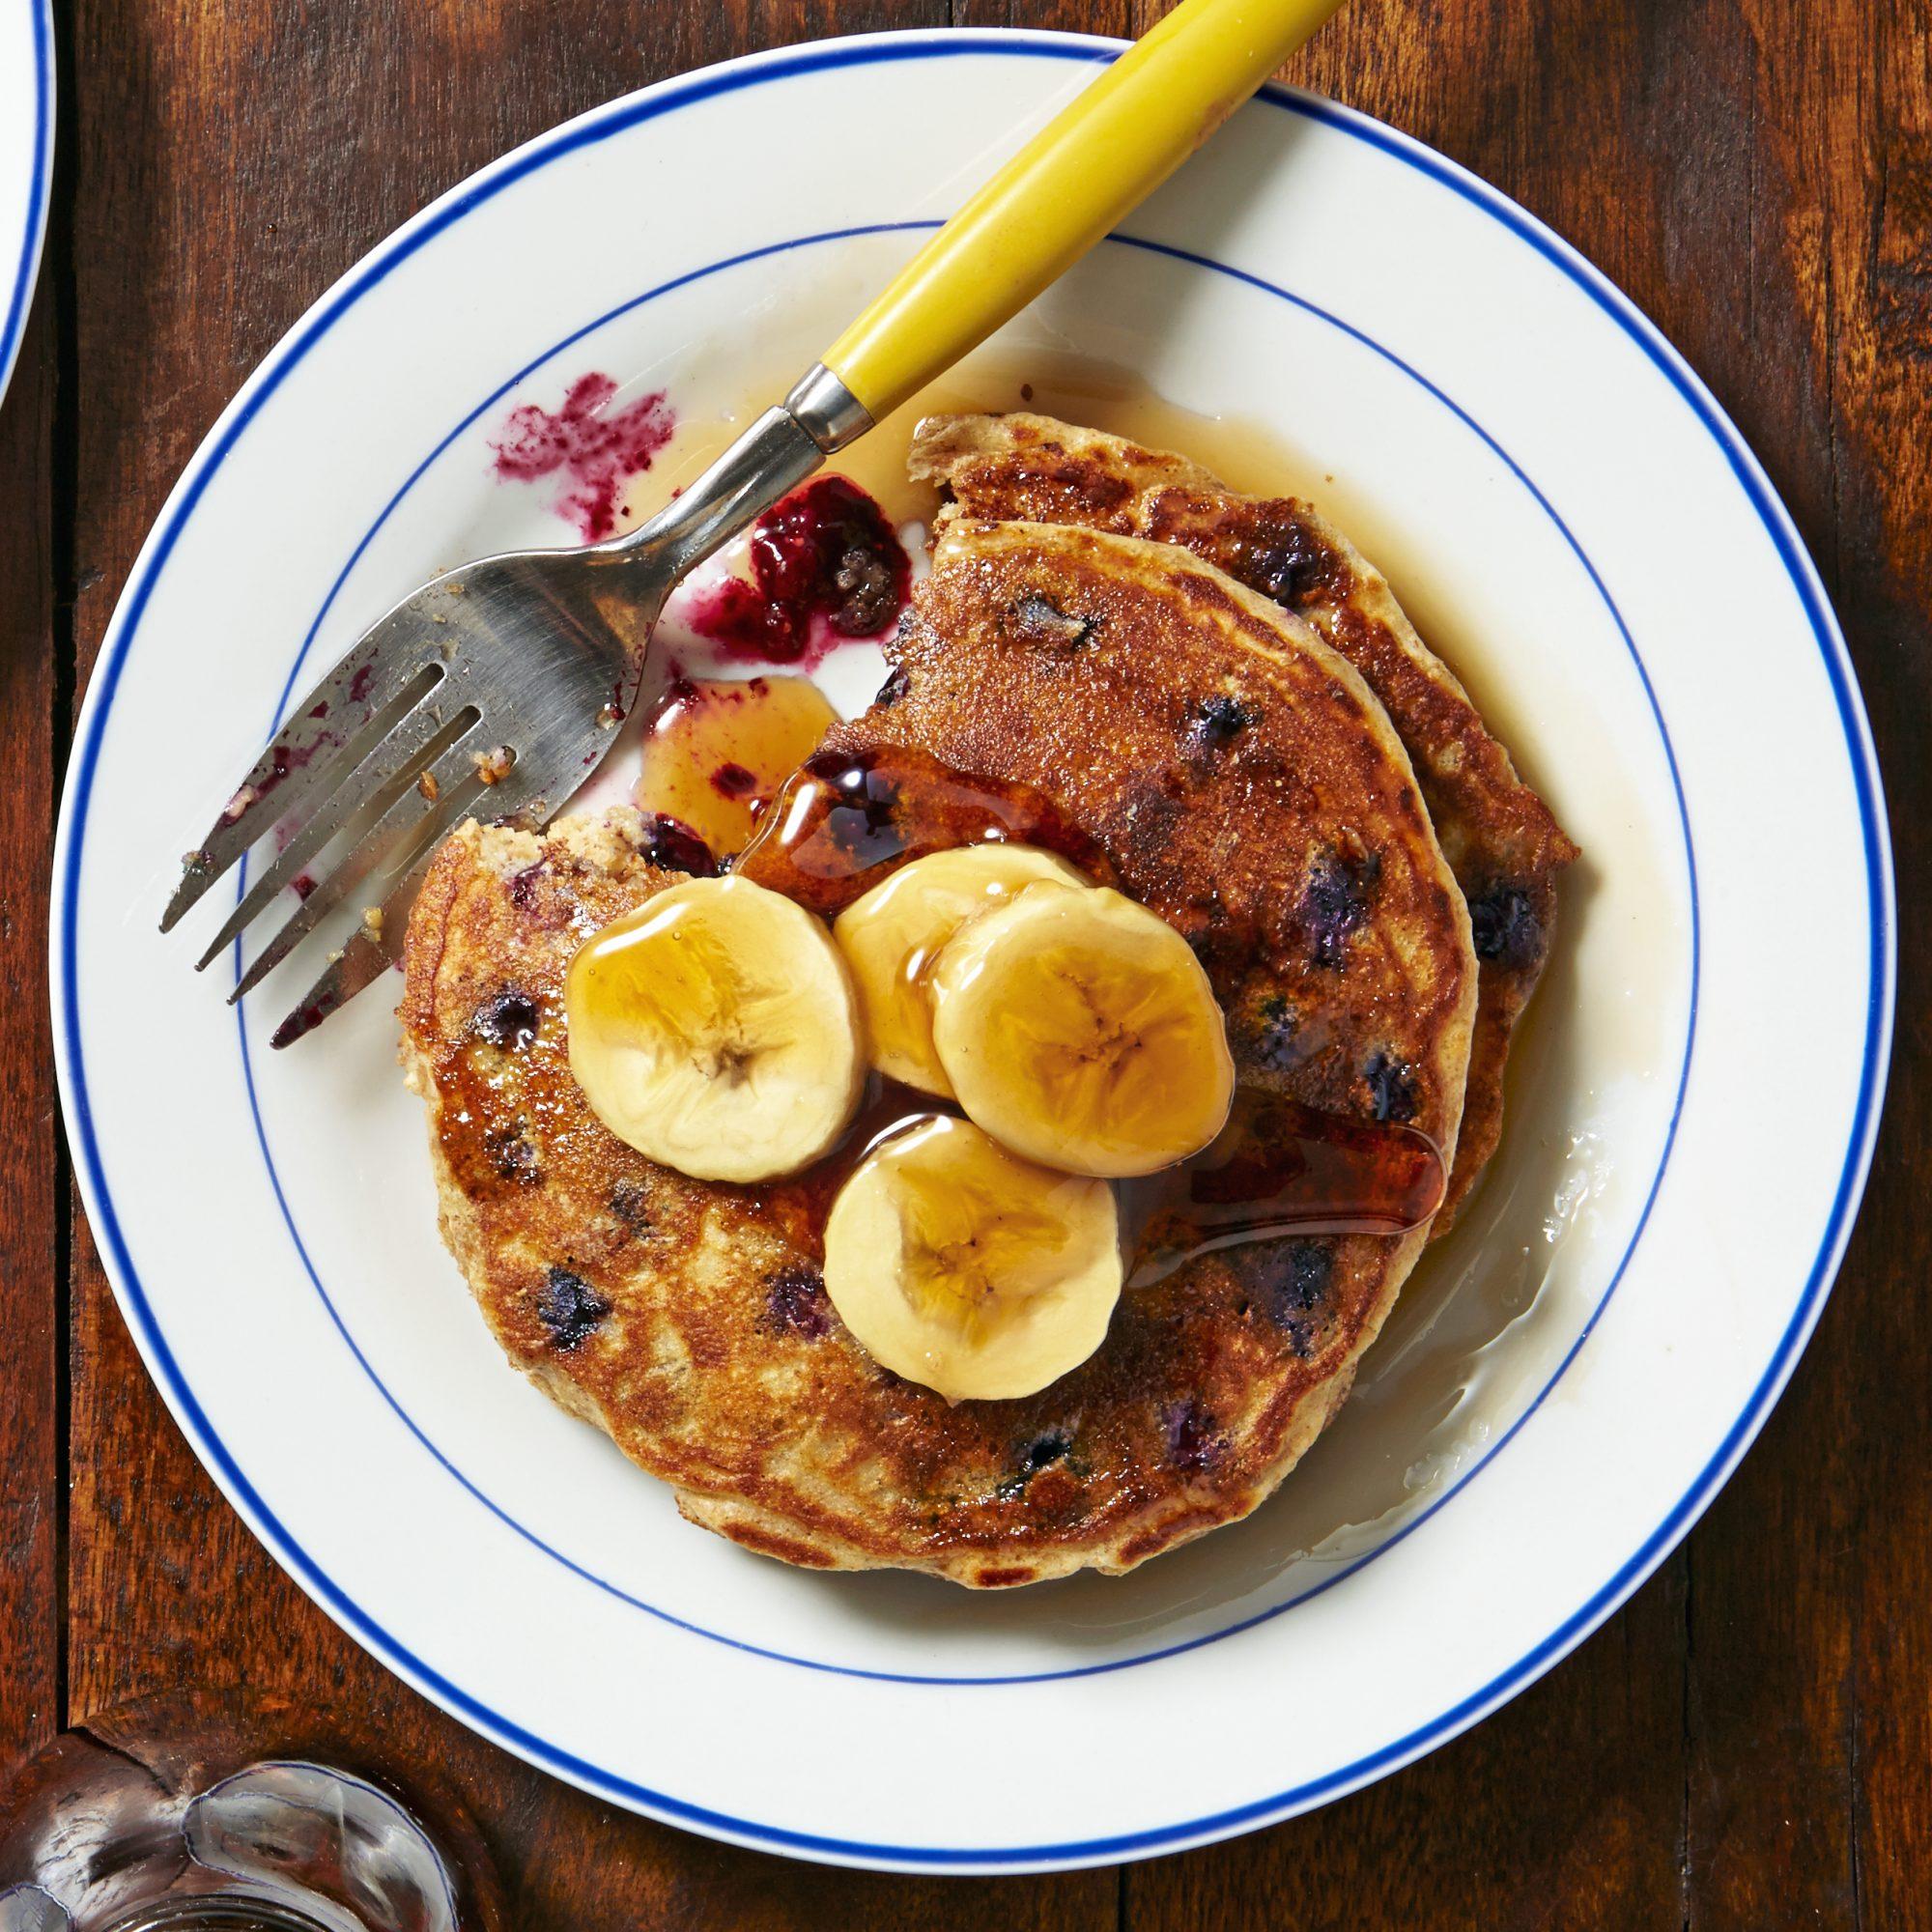 Blueberry Pancakes with Caramelized Bananas